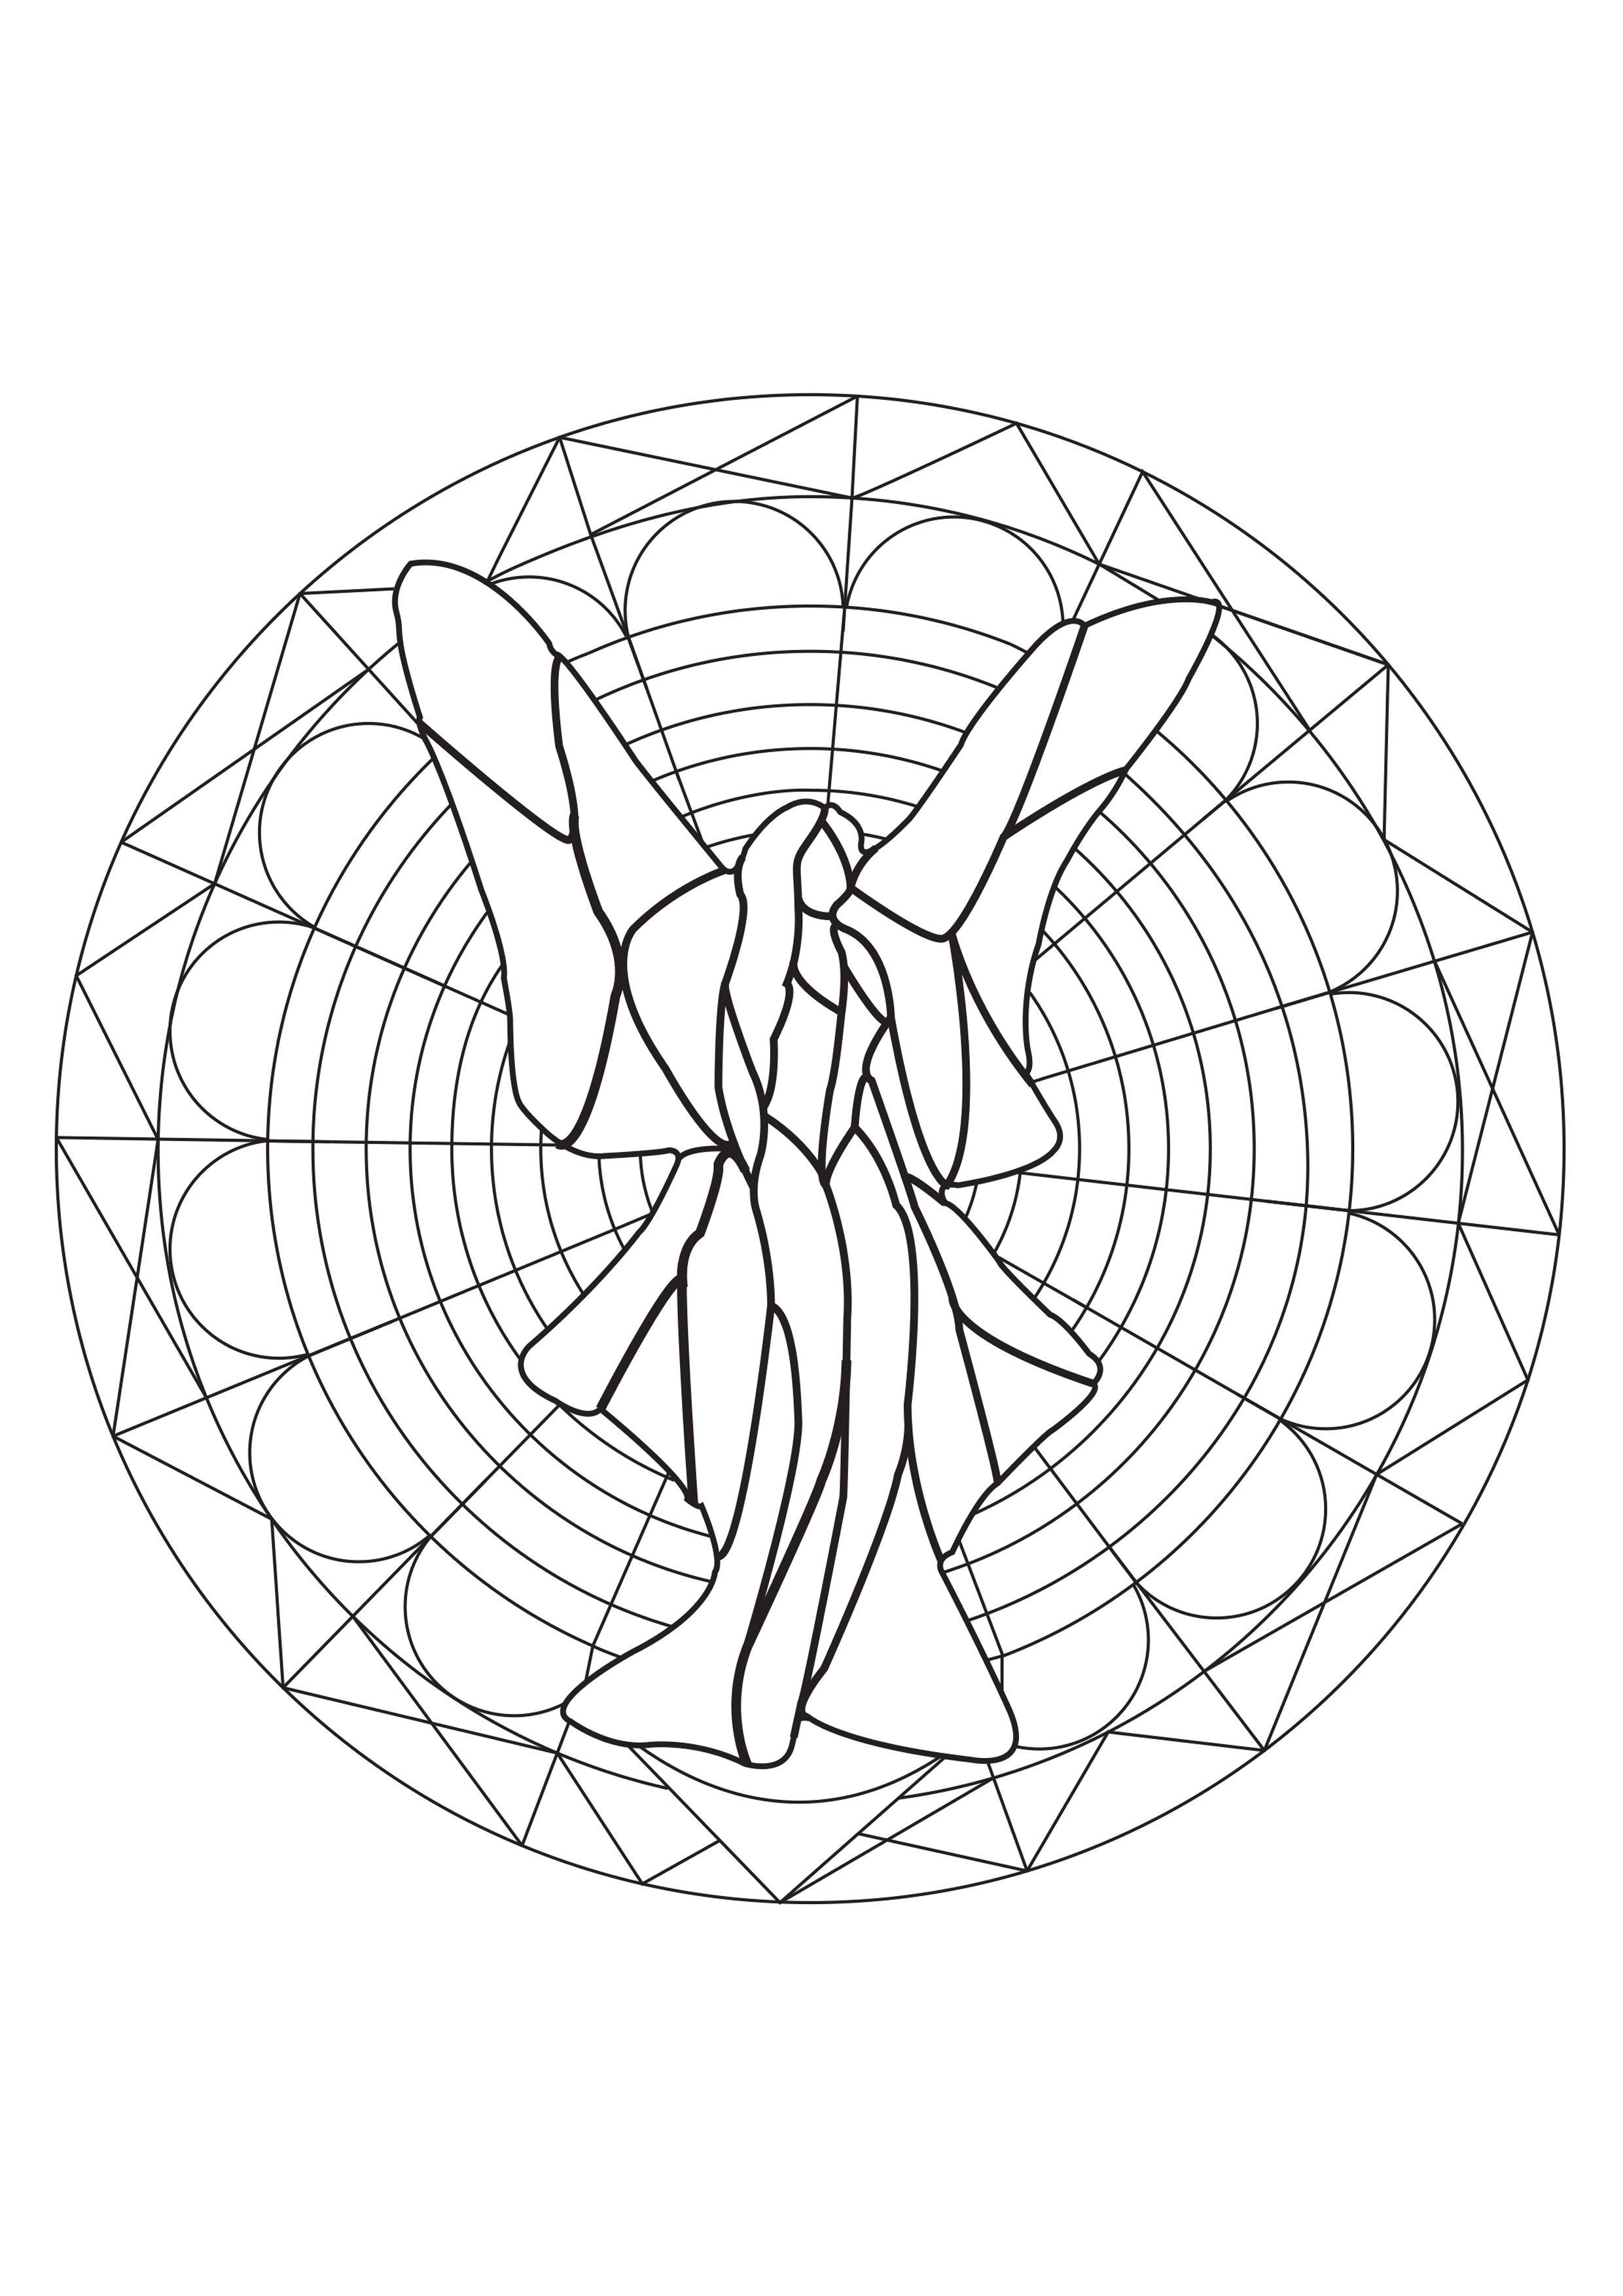 Mandalas Coloring Pages For Adults Mandala Vorlagen Ausmalen Vorlagen